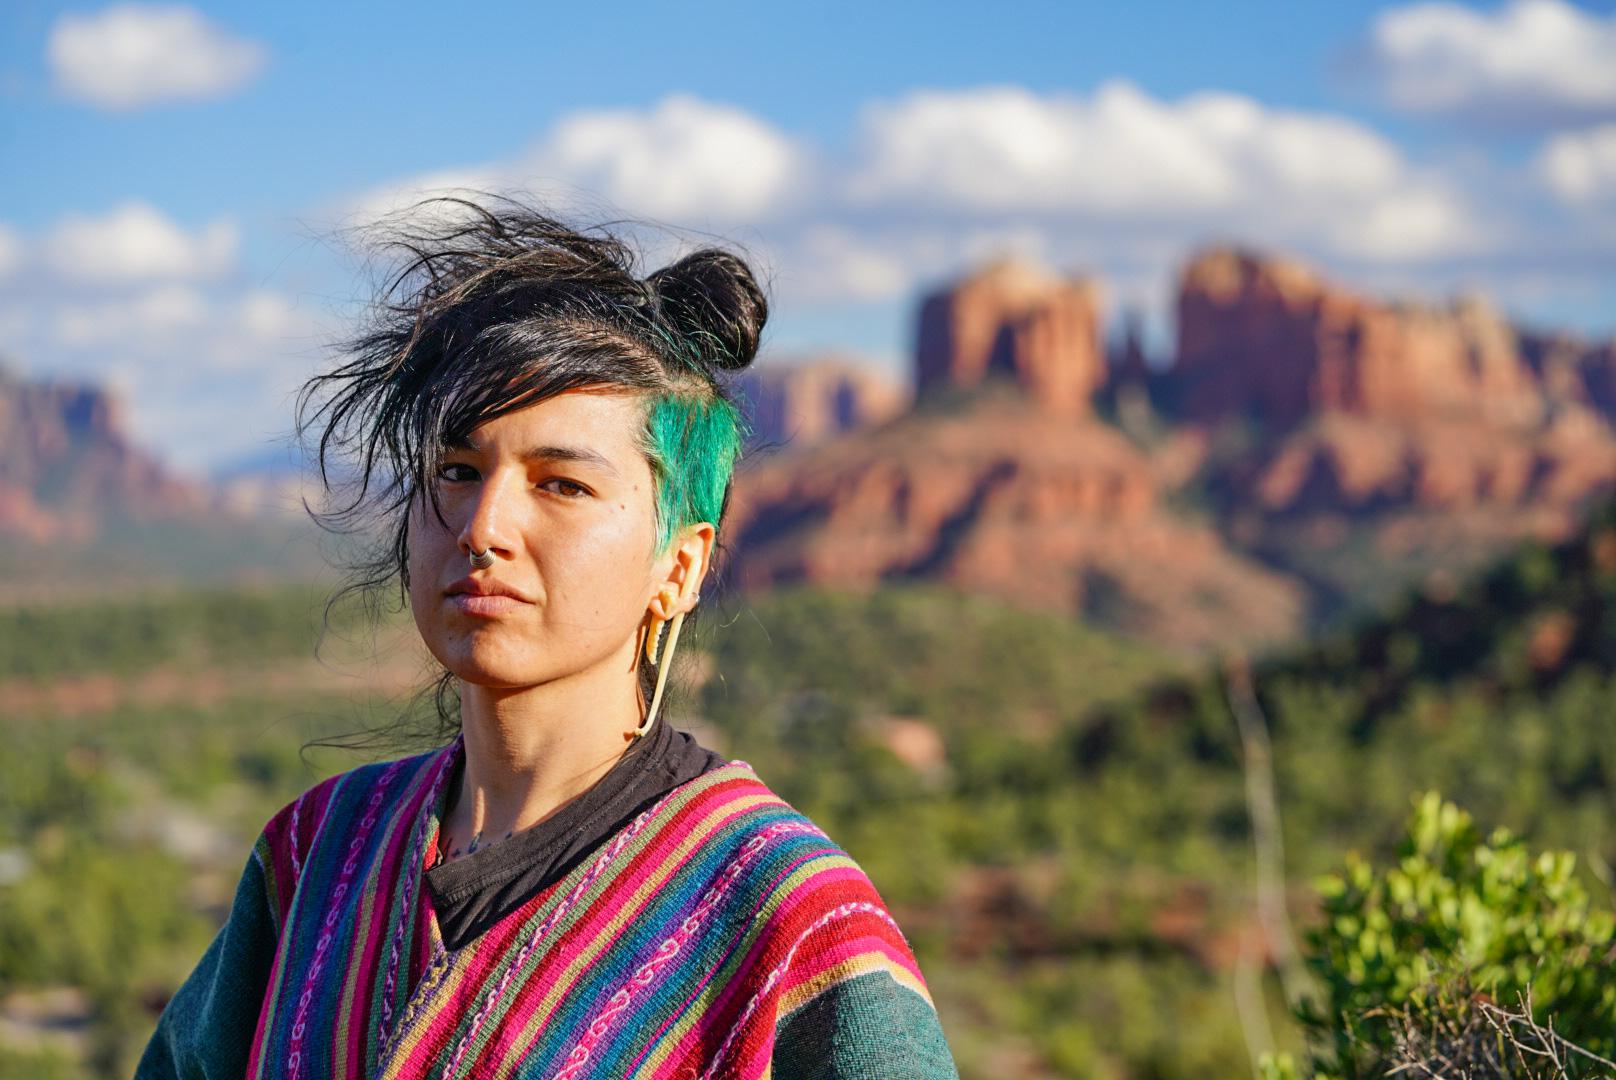 Pınar AteŞ Sinopoulos-Lloyd - Co-Founder, Queer Nature